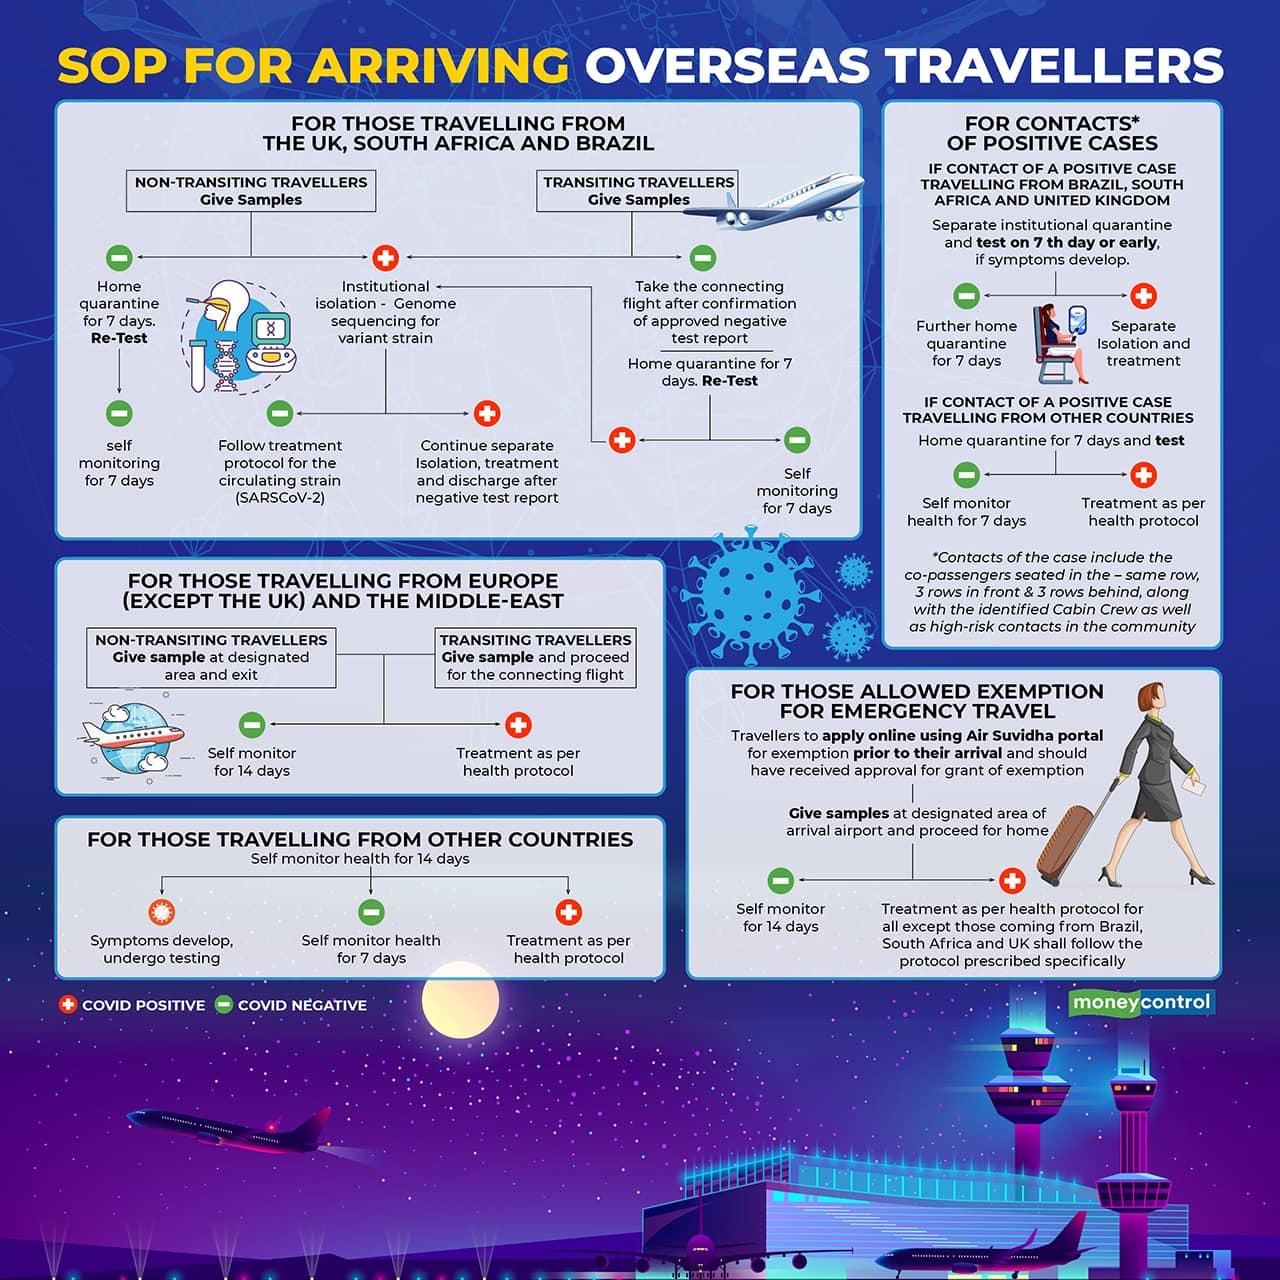 SOP-for-Arriving-Overseas-Travellers